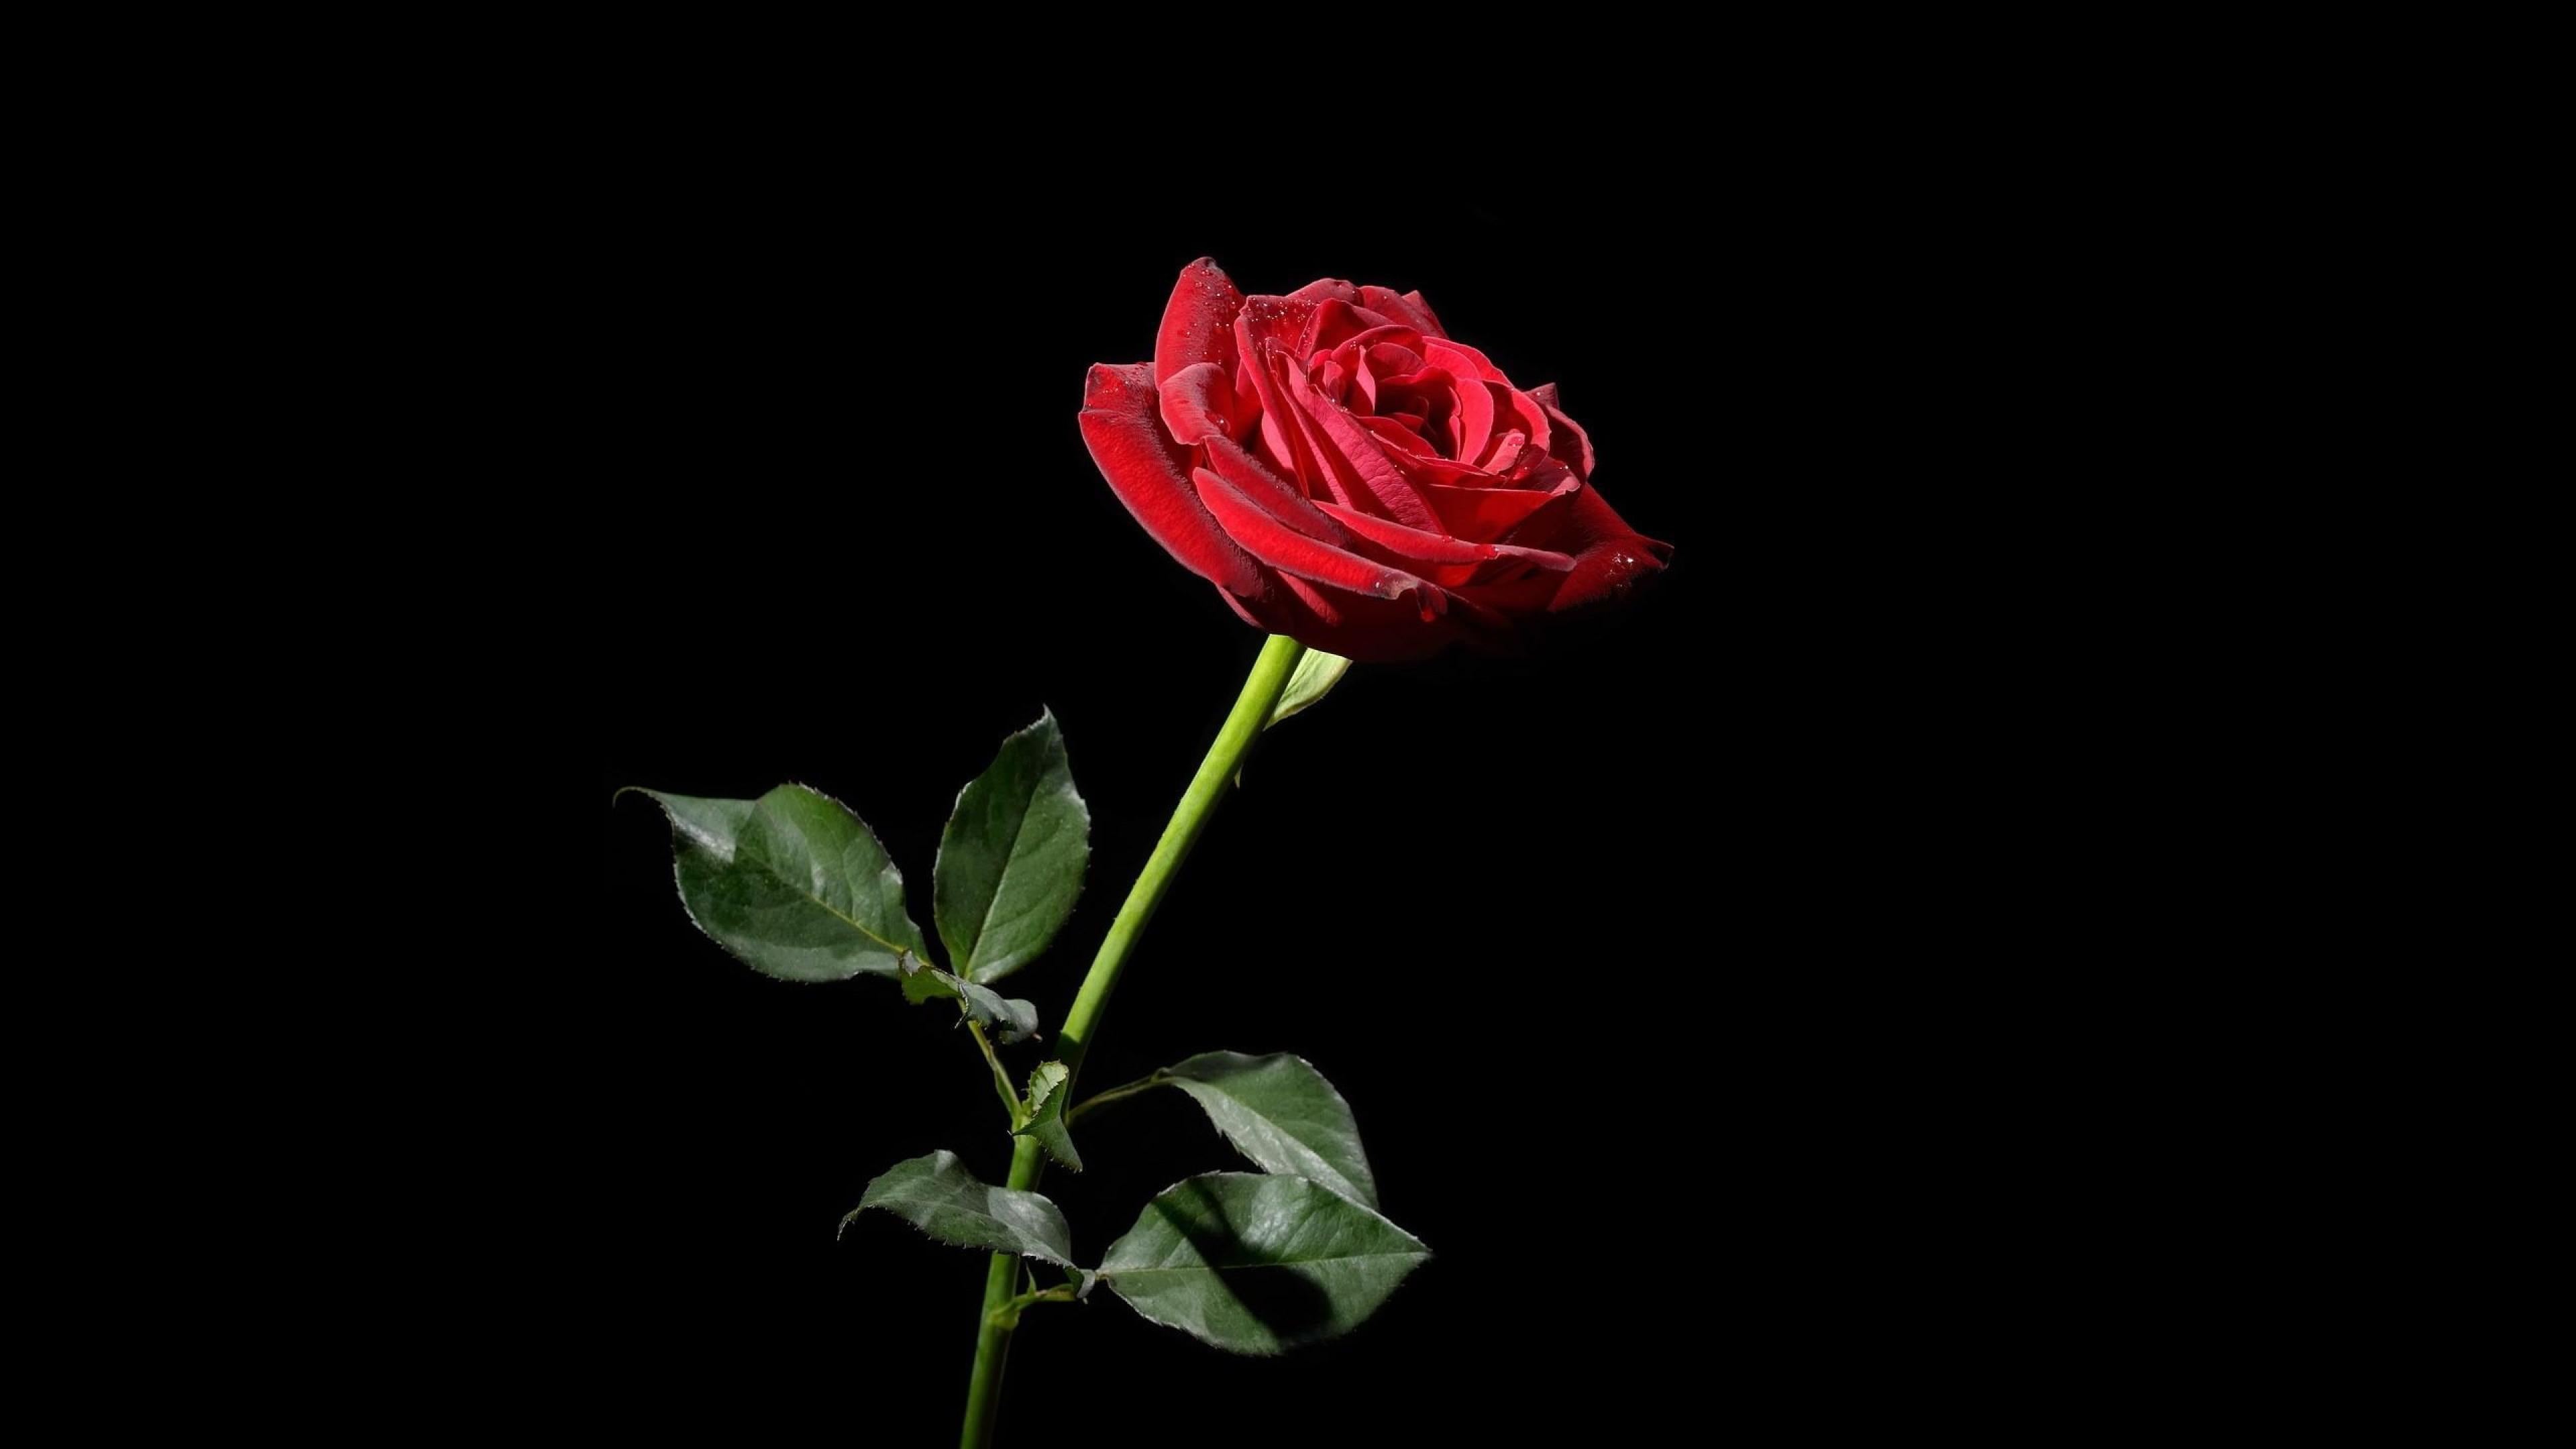 Rose Red Flower Black background Wallpaper Background 4K Ultra HD 3840x2160